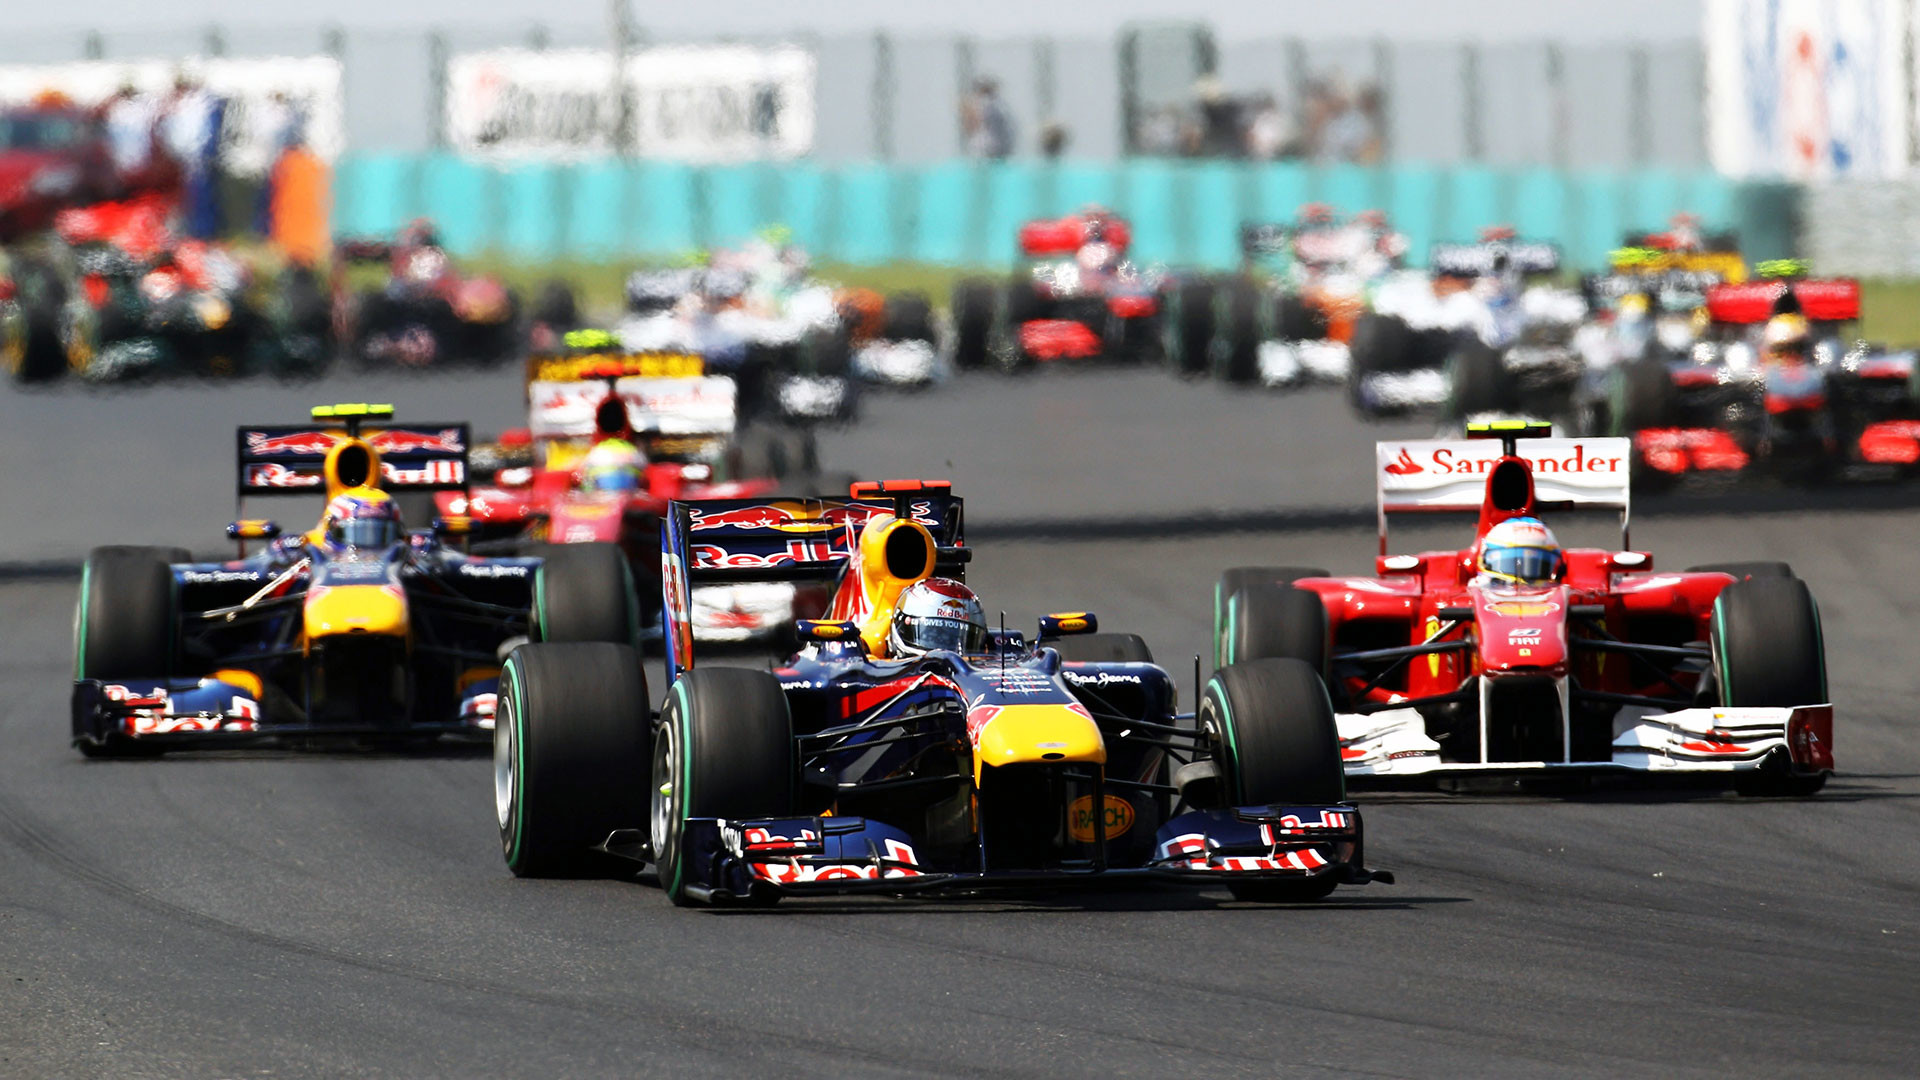 F1-Fansite.com HD Wallpaper 2010 Hungary F1 GP_03.jpg …